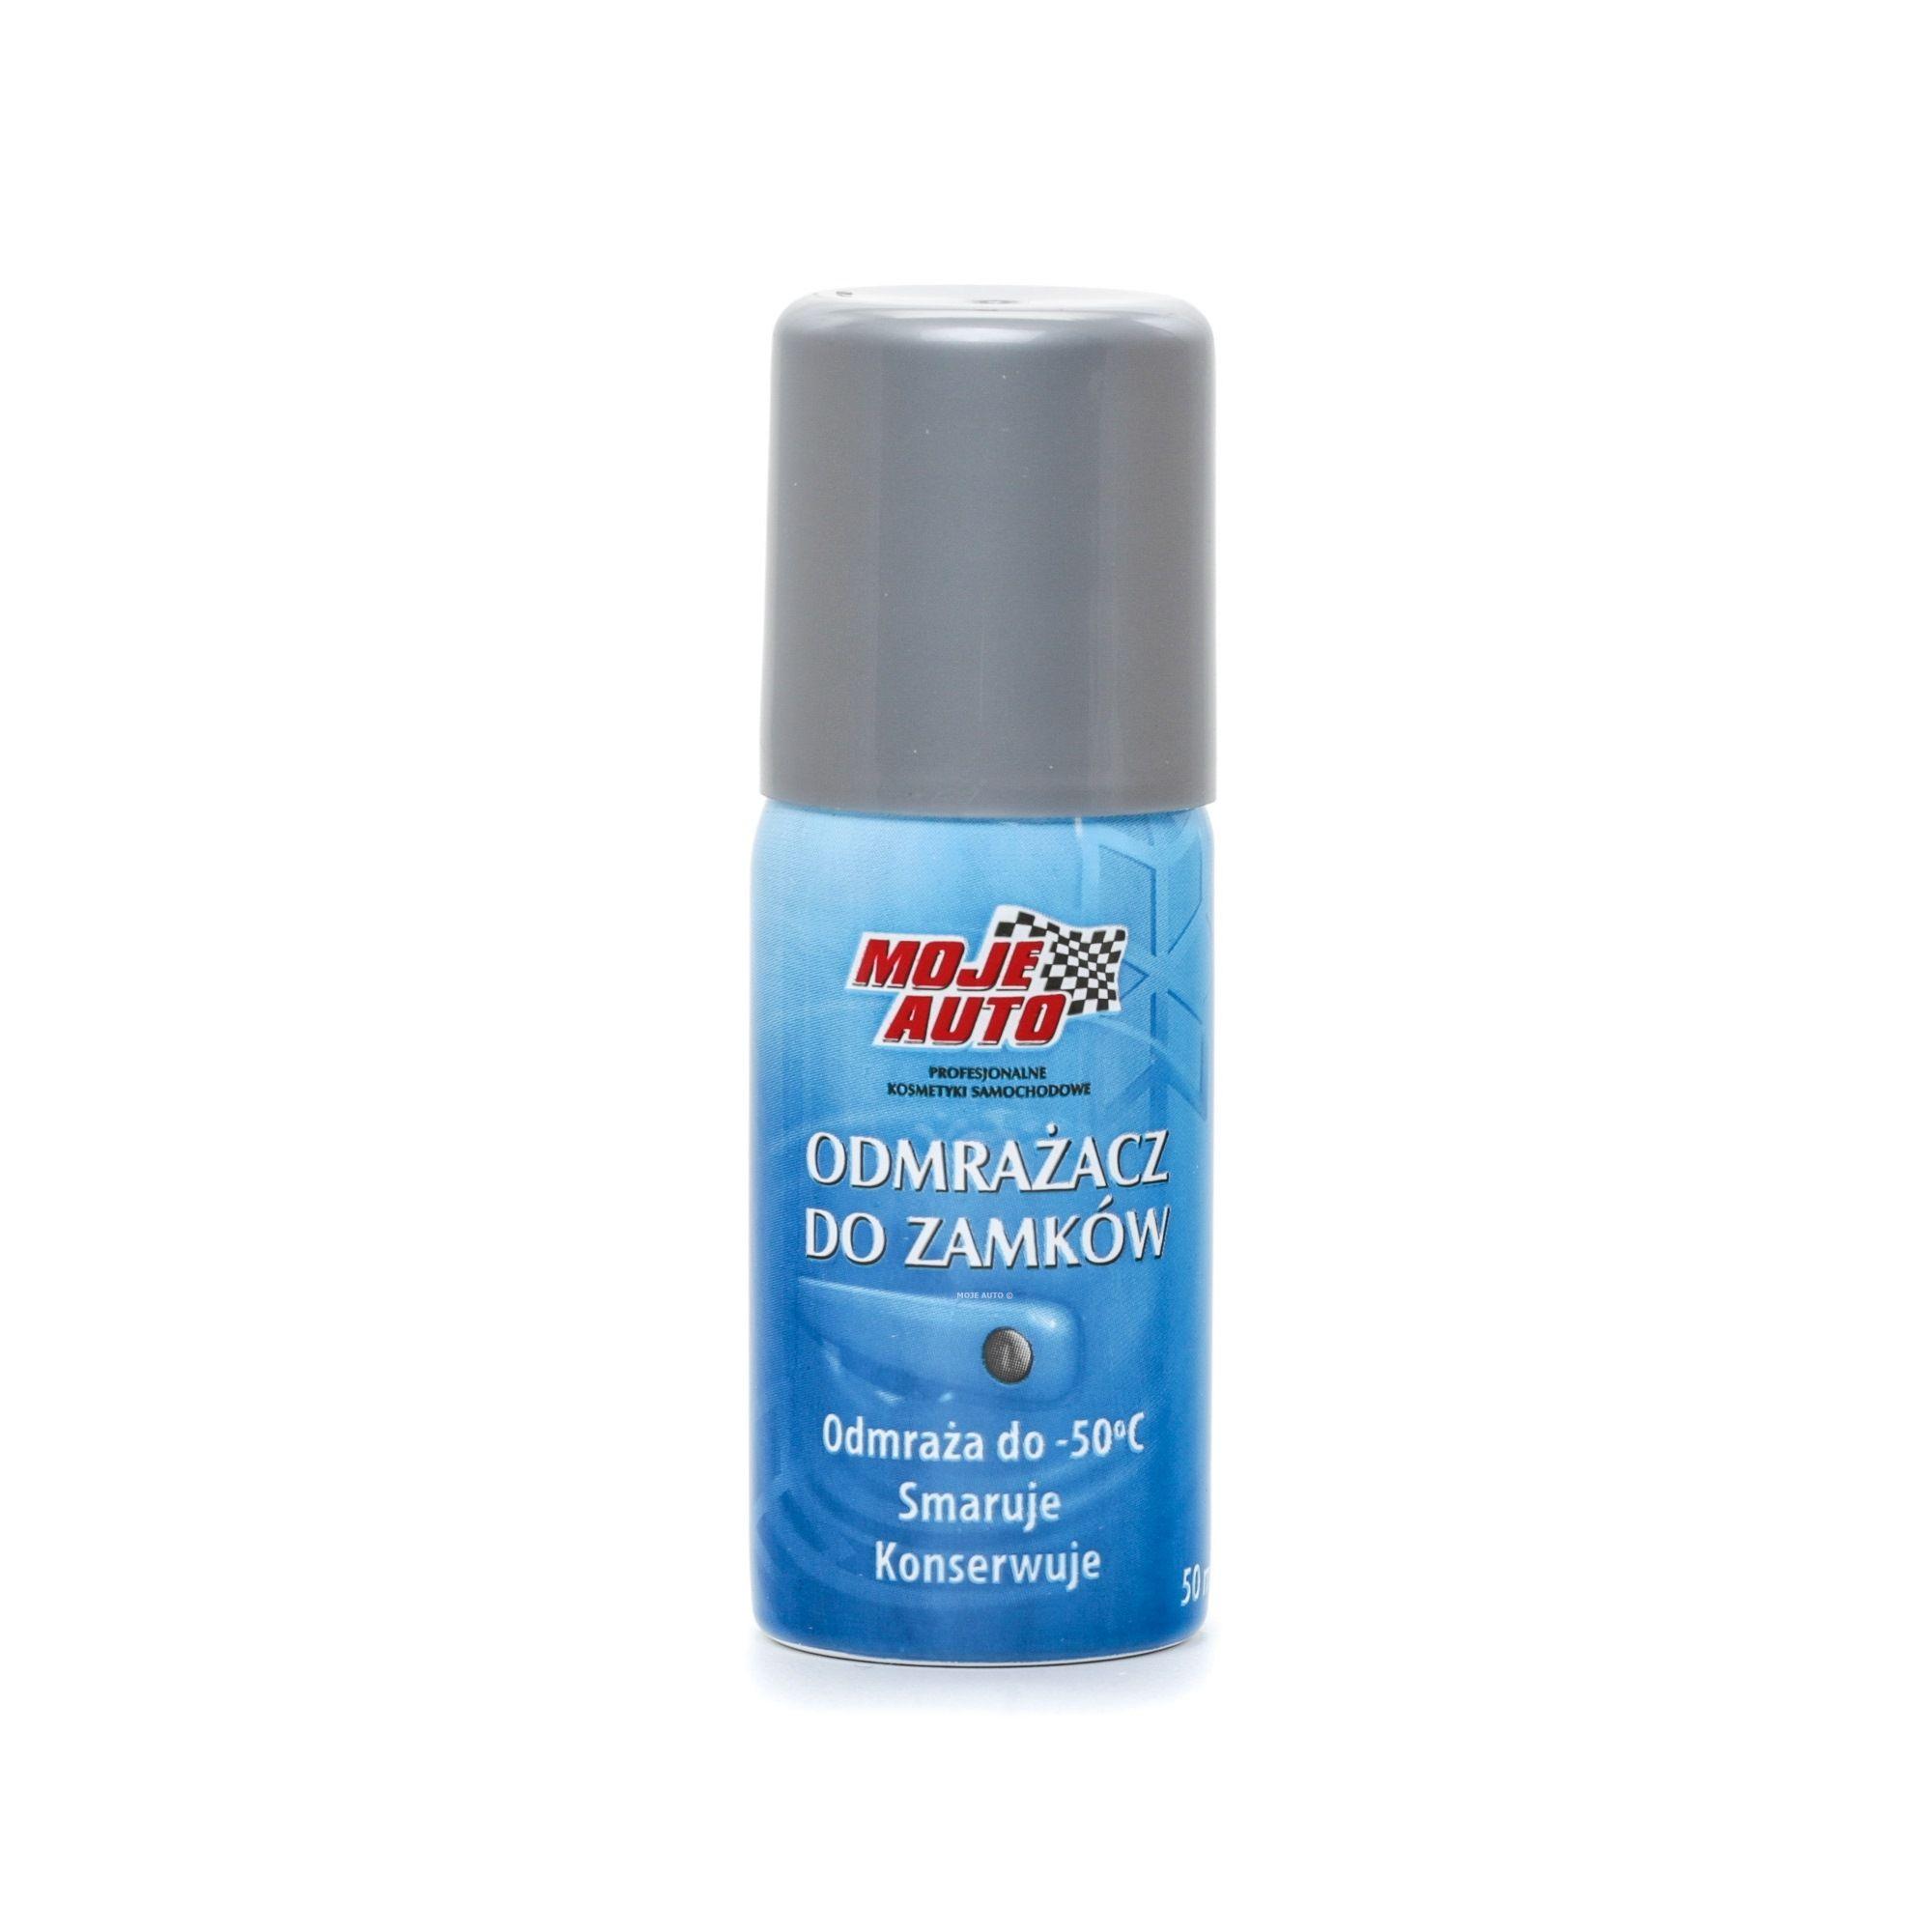 Enteiser-Spray MOJE AUTO 25-013 Bewertung